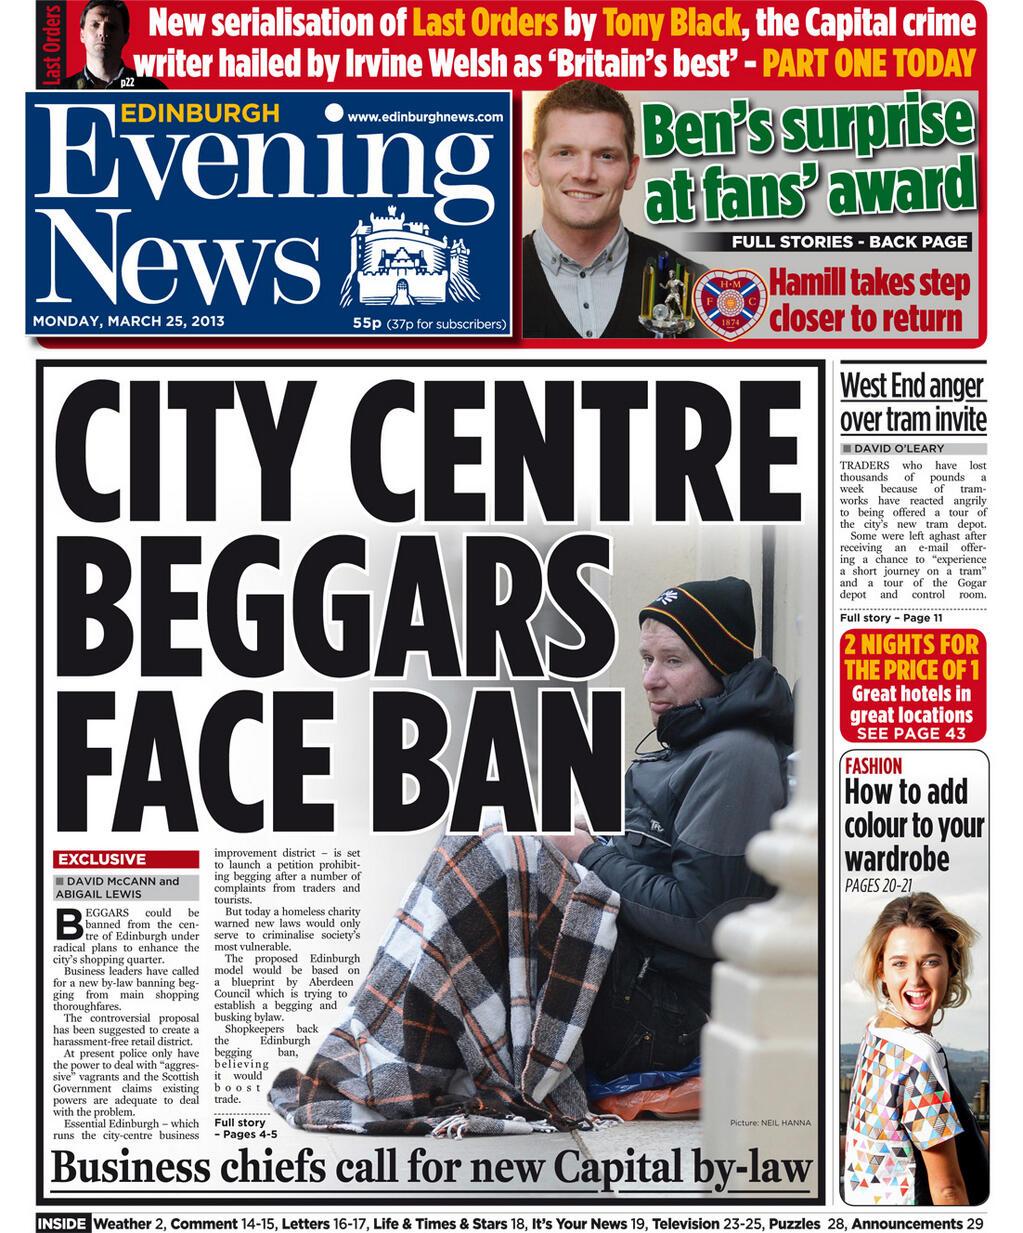 edinburgh daytime current information articles